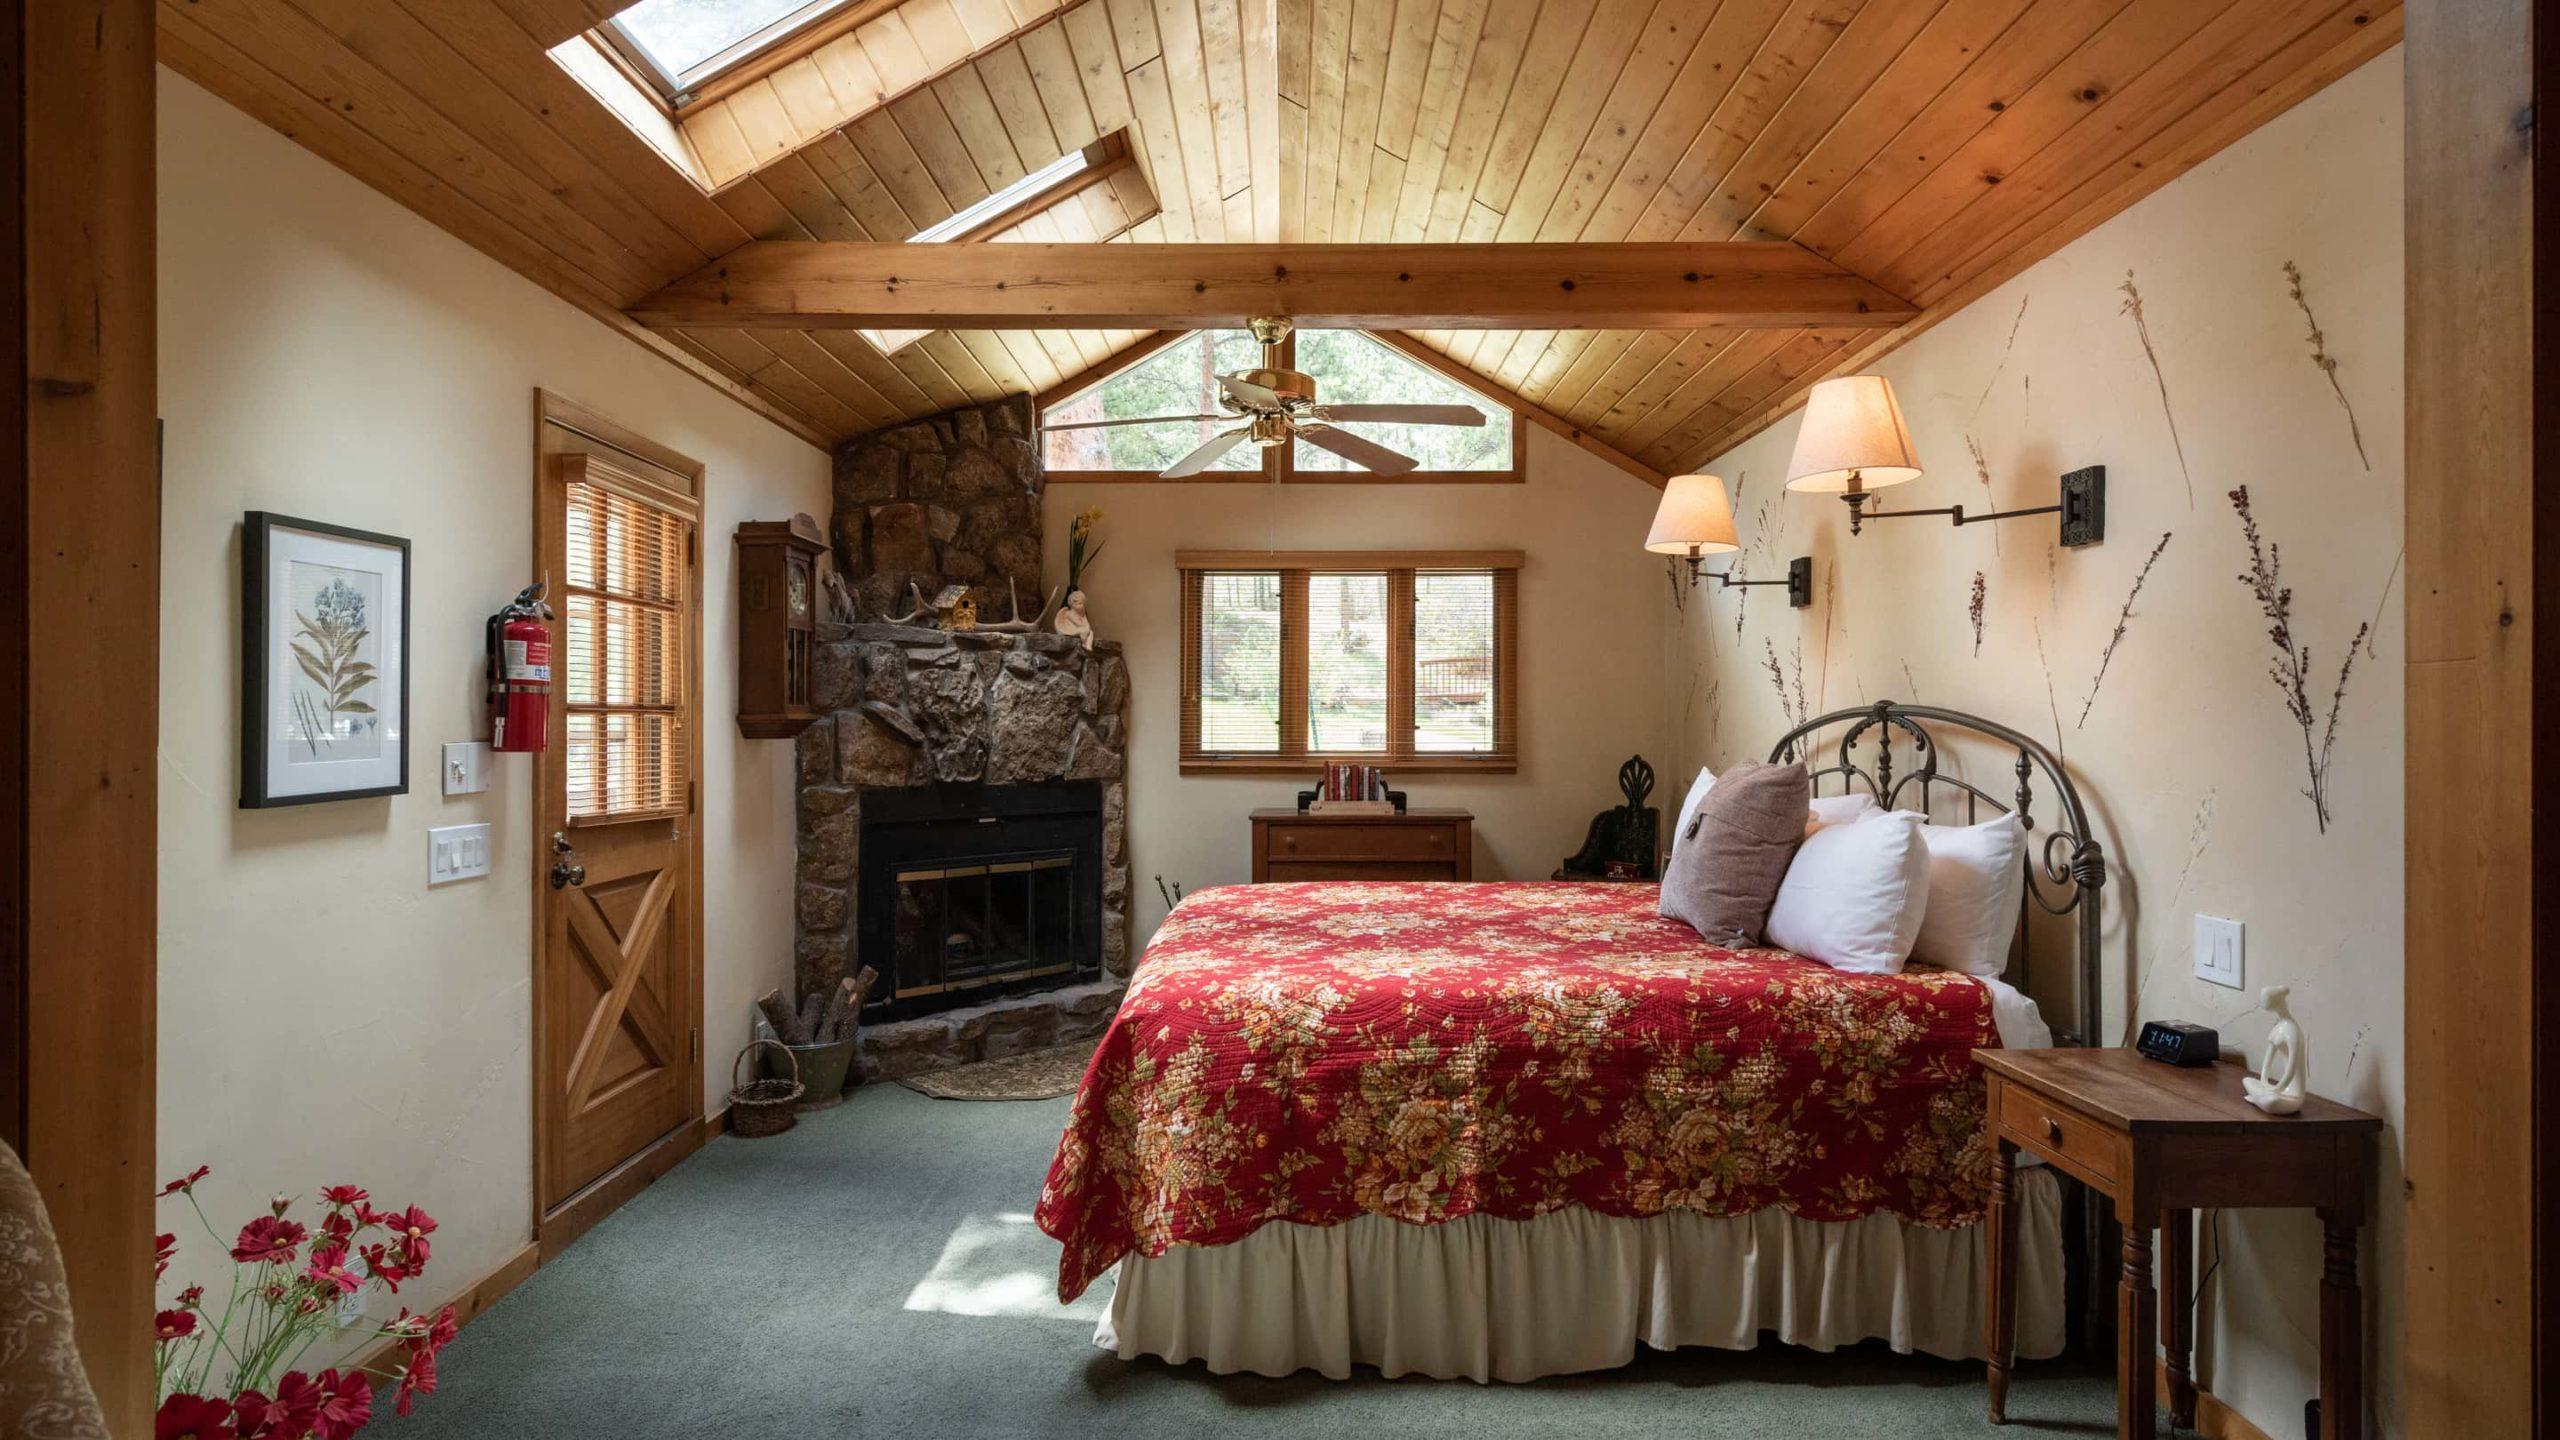 Chiming Bells room